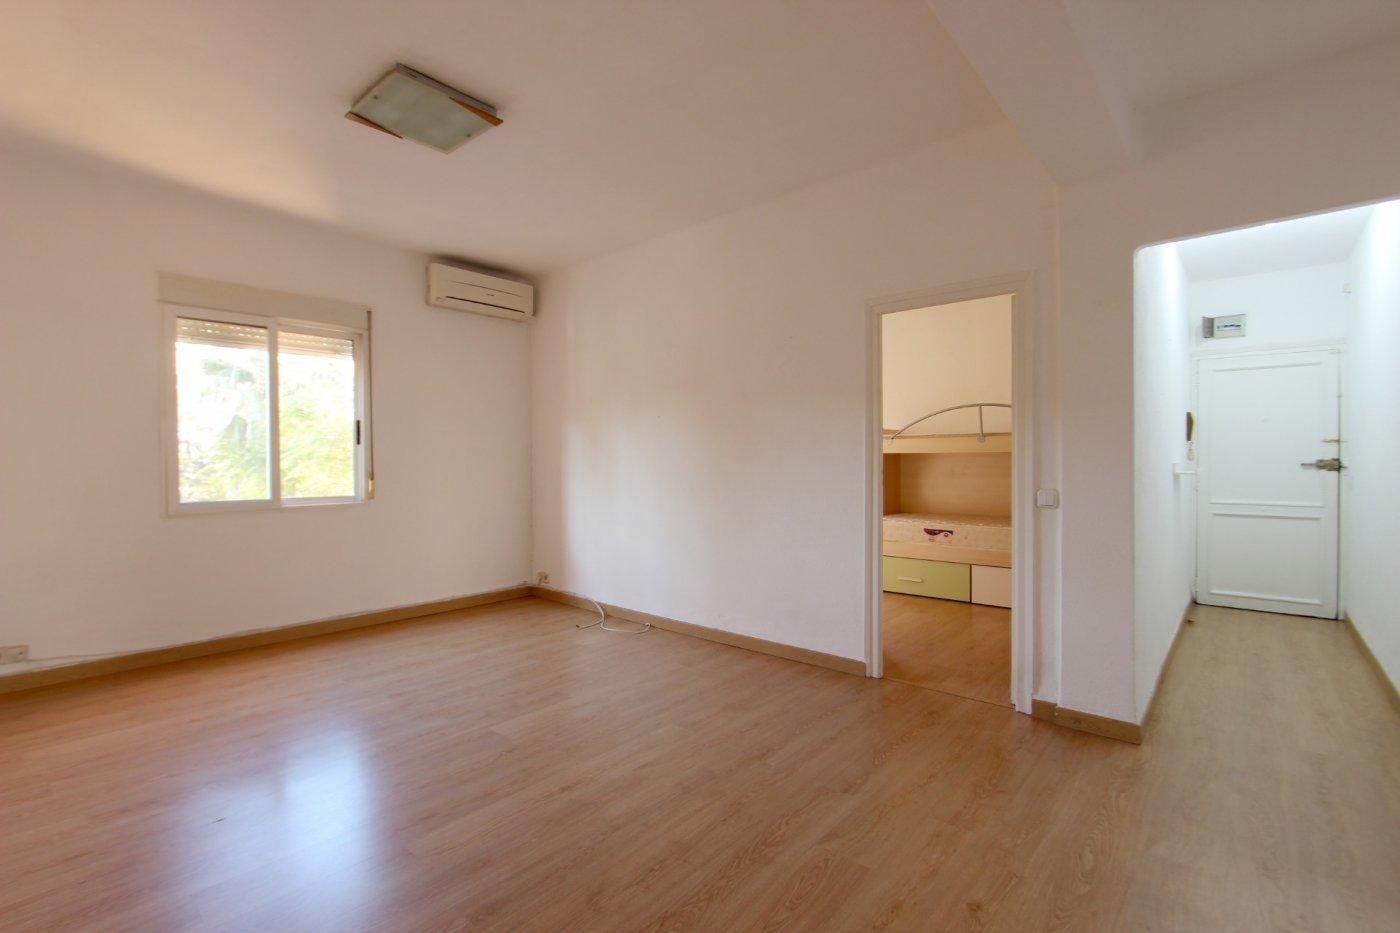 piso en valencia · la-creu-del-grau 0€